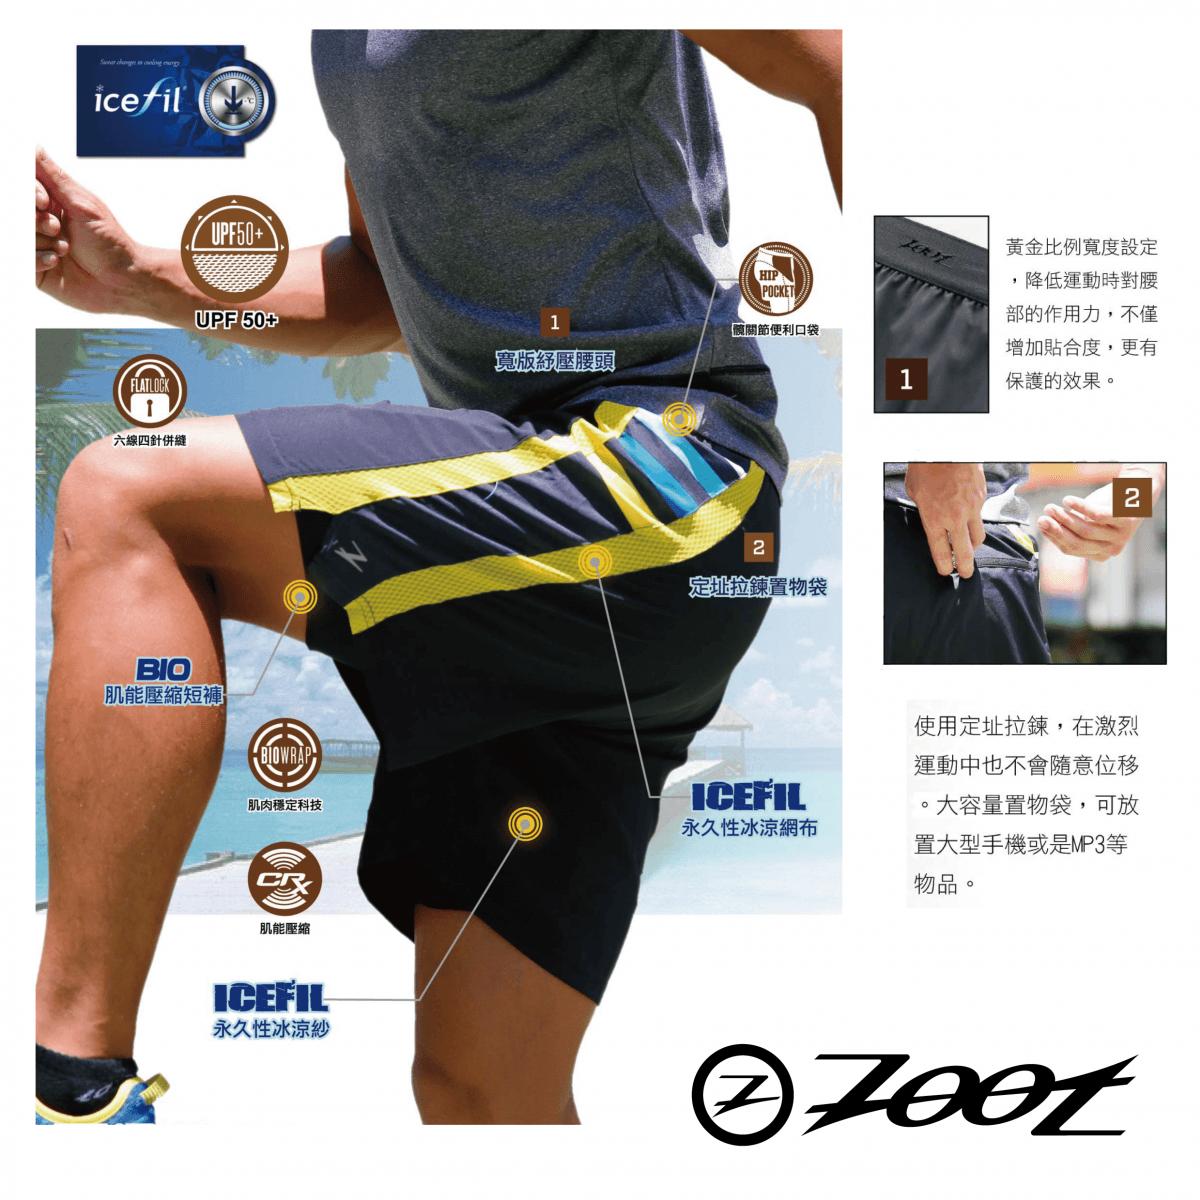 【ZOOT】 冰涼感二合一7吋輕肌能跑褲 (男) 2